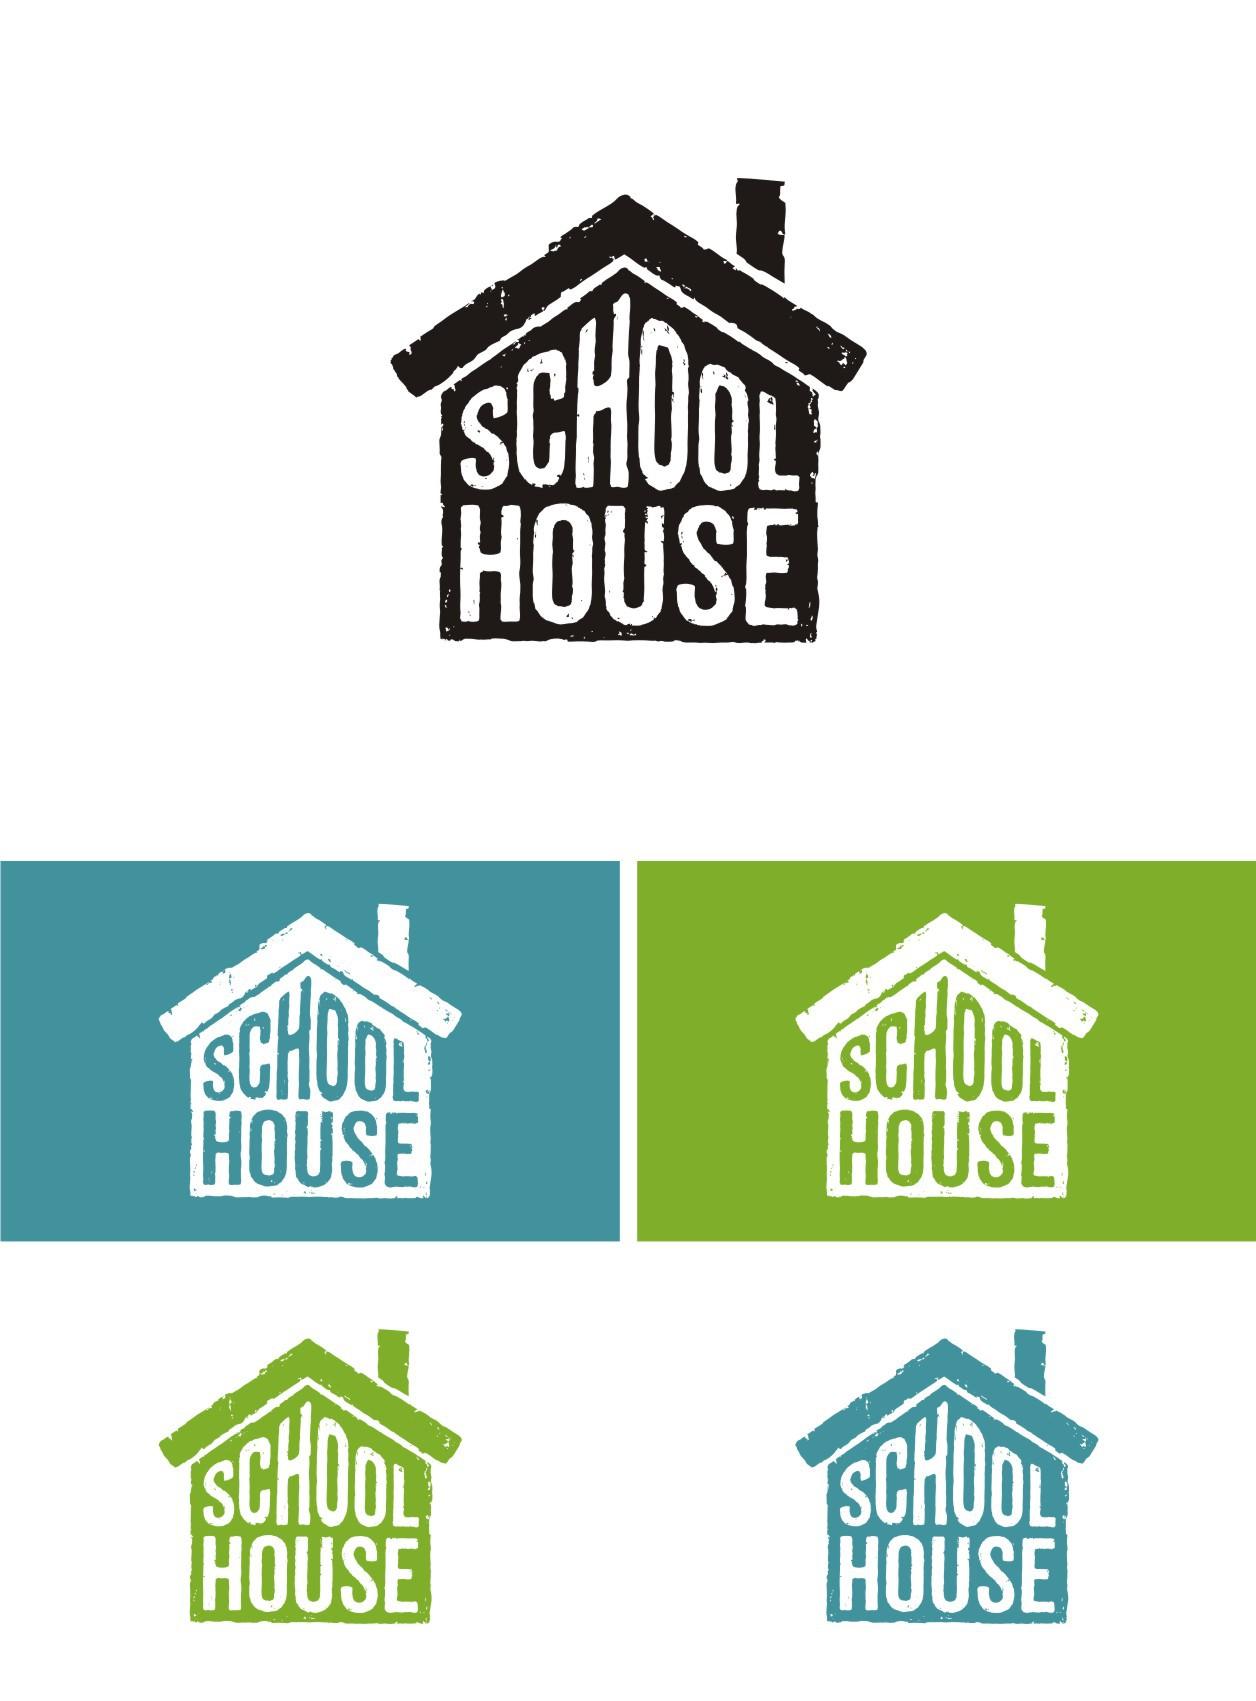 An alternative school needs a striking, professional illustrated logo